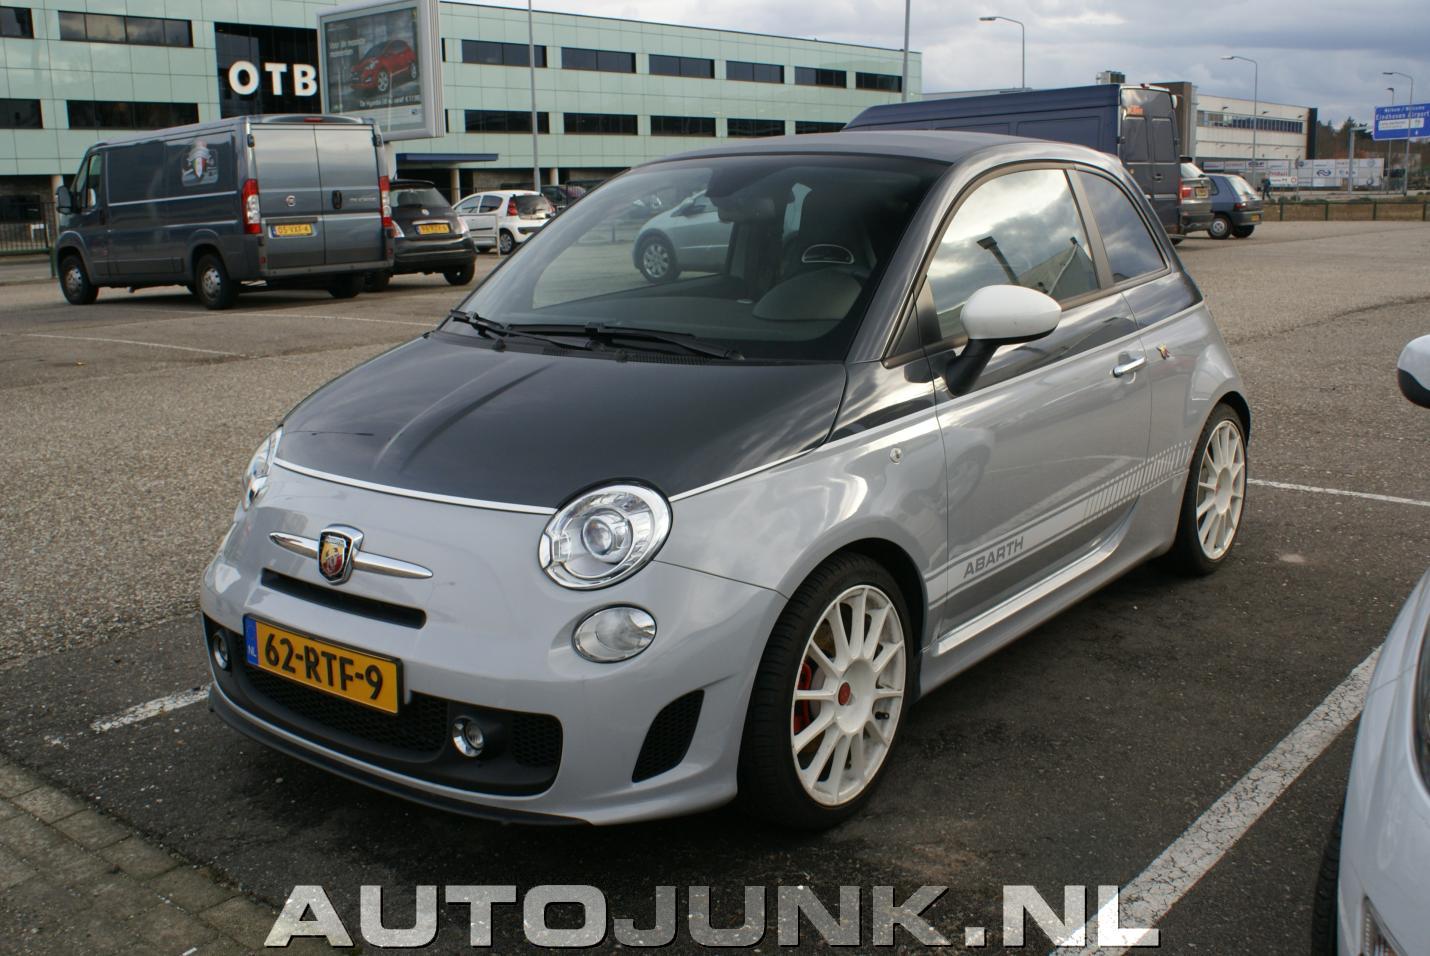 Fiat 500 Abarth Esseesse foto's » Autojunk.nl (91056)